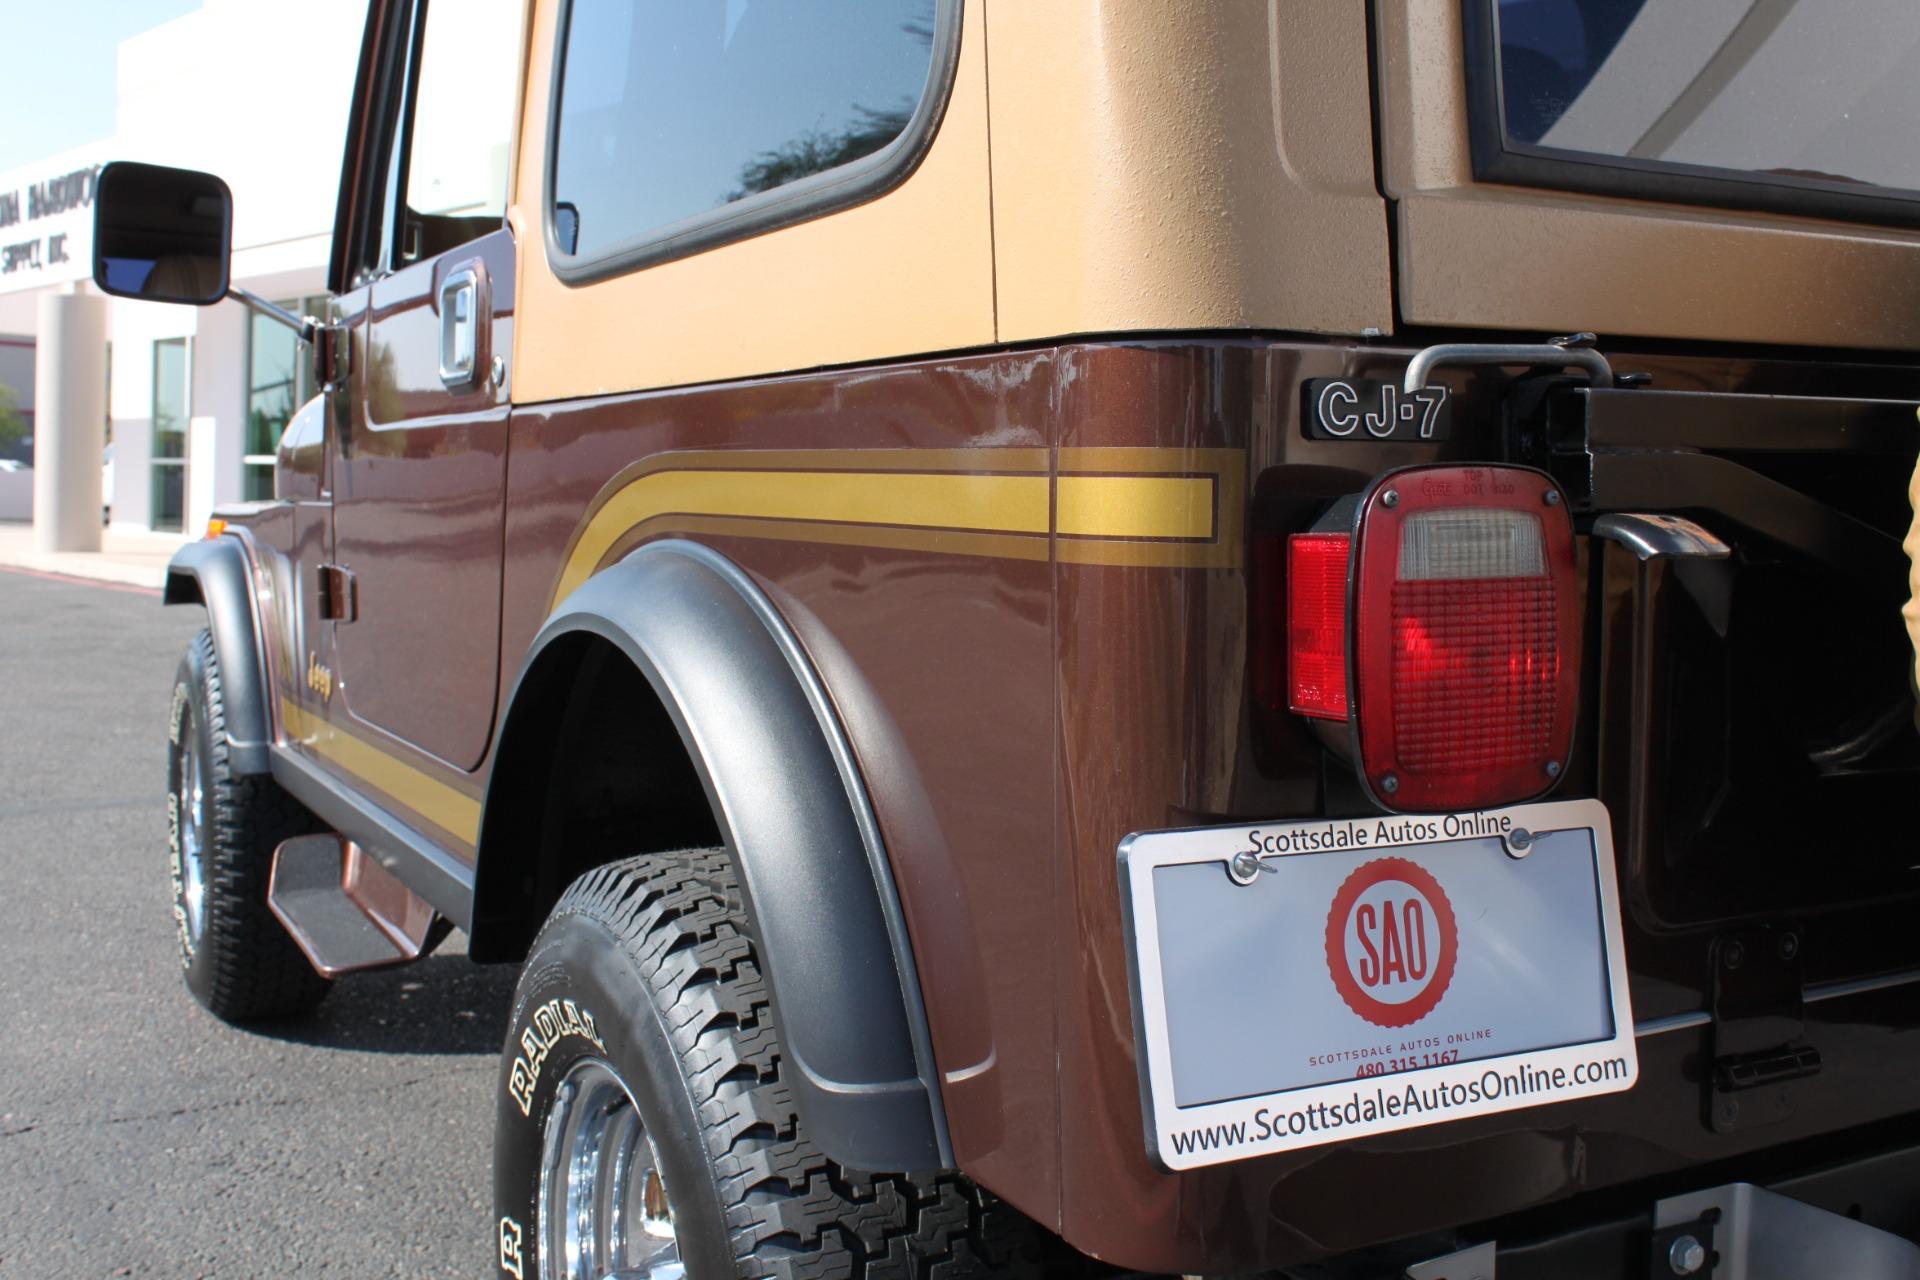 Used-1985-Jeep-CJ-7-Laredo-4WD-Camaro